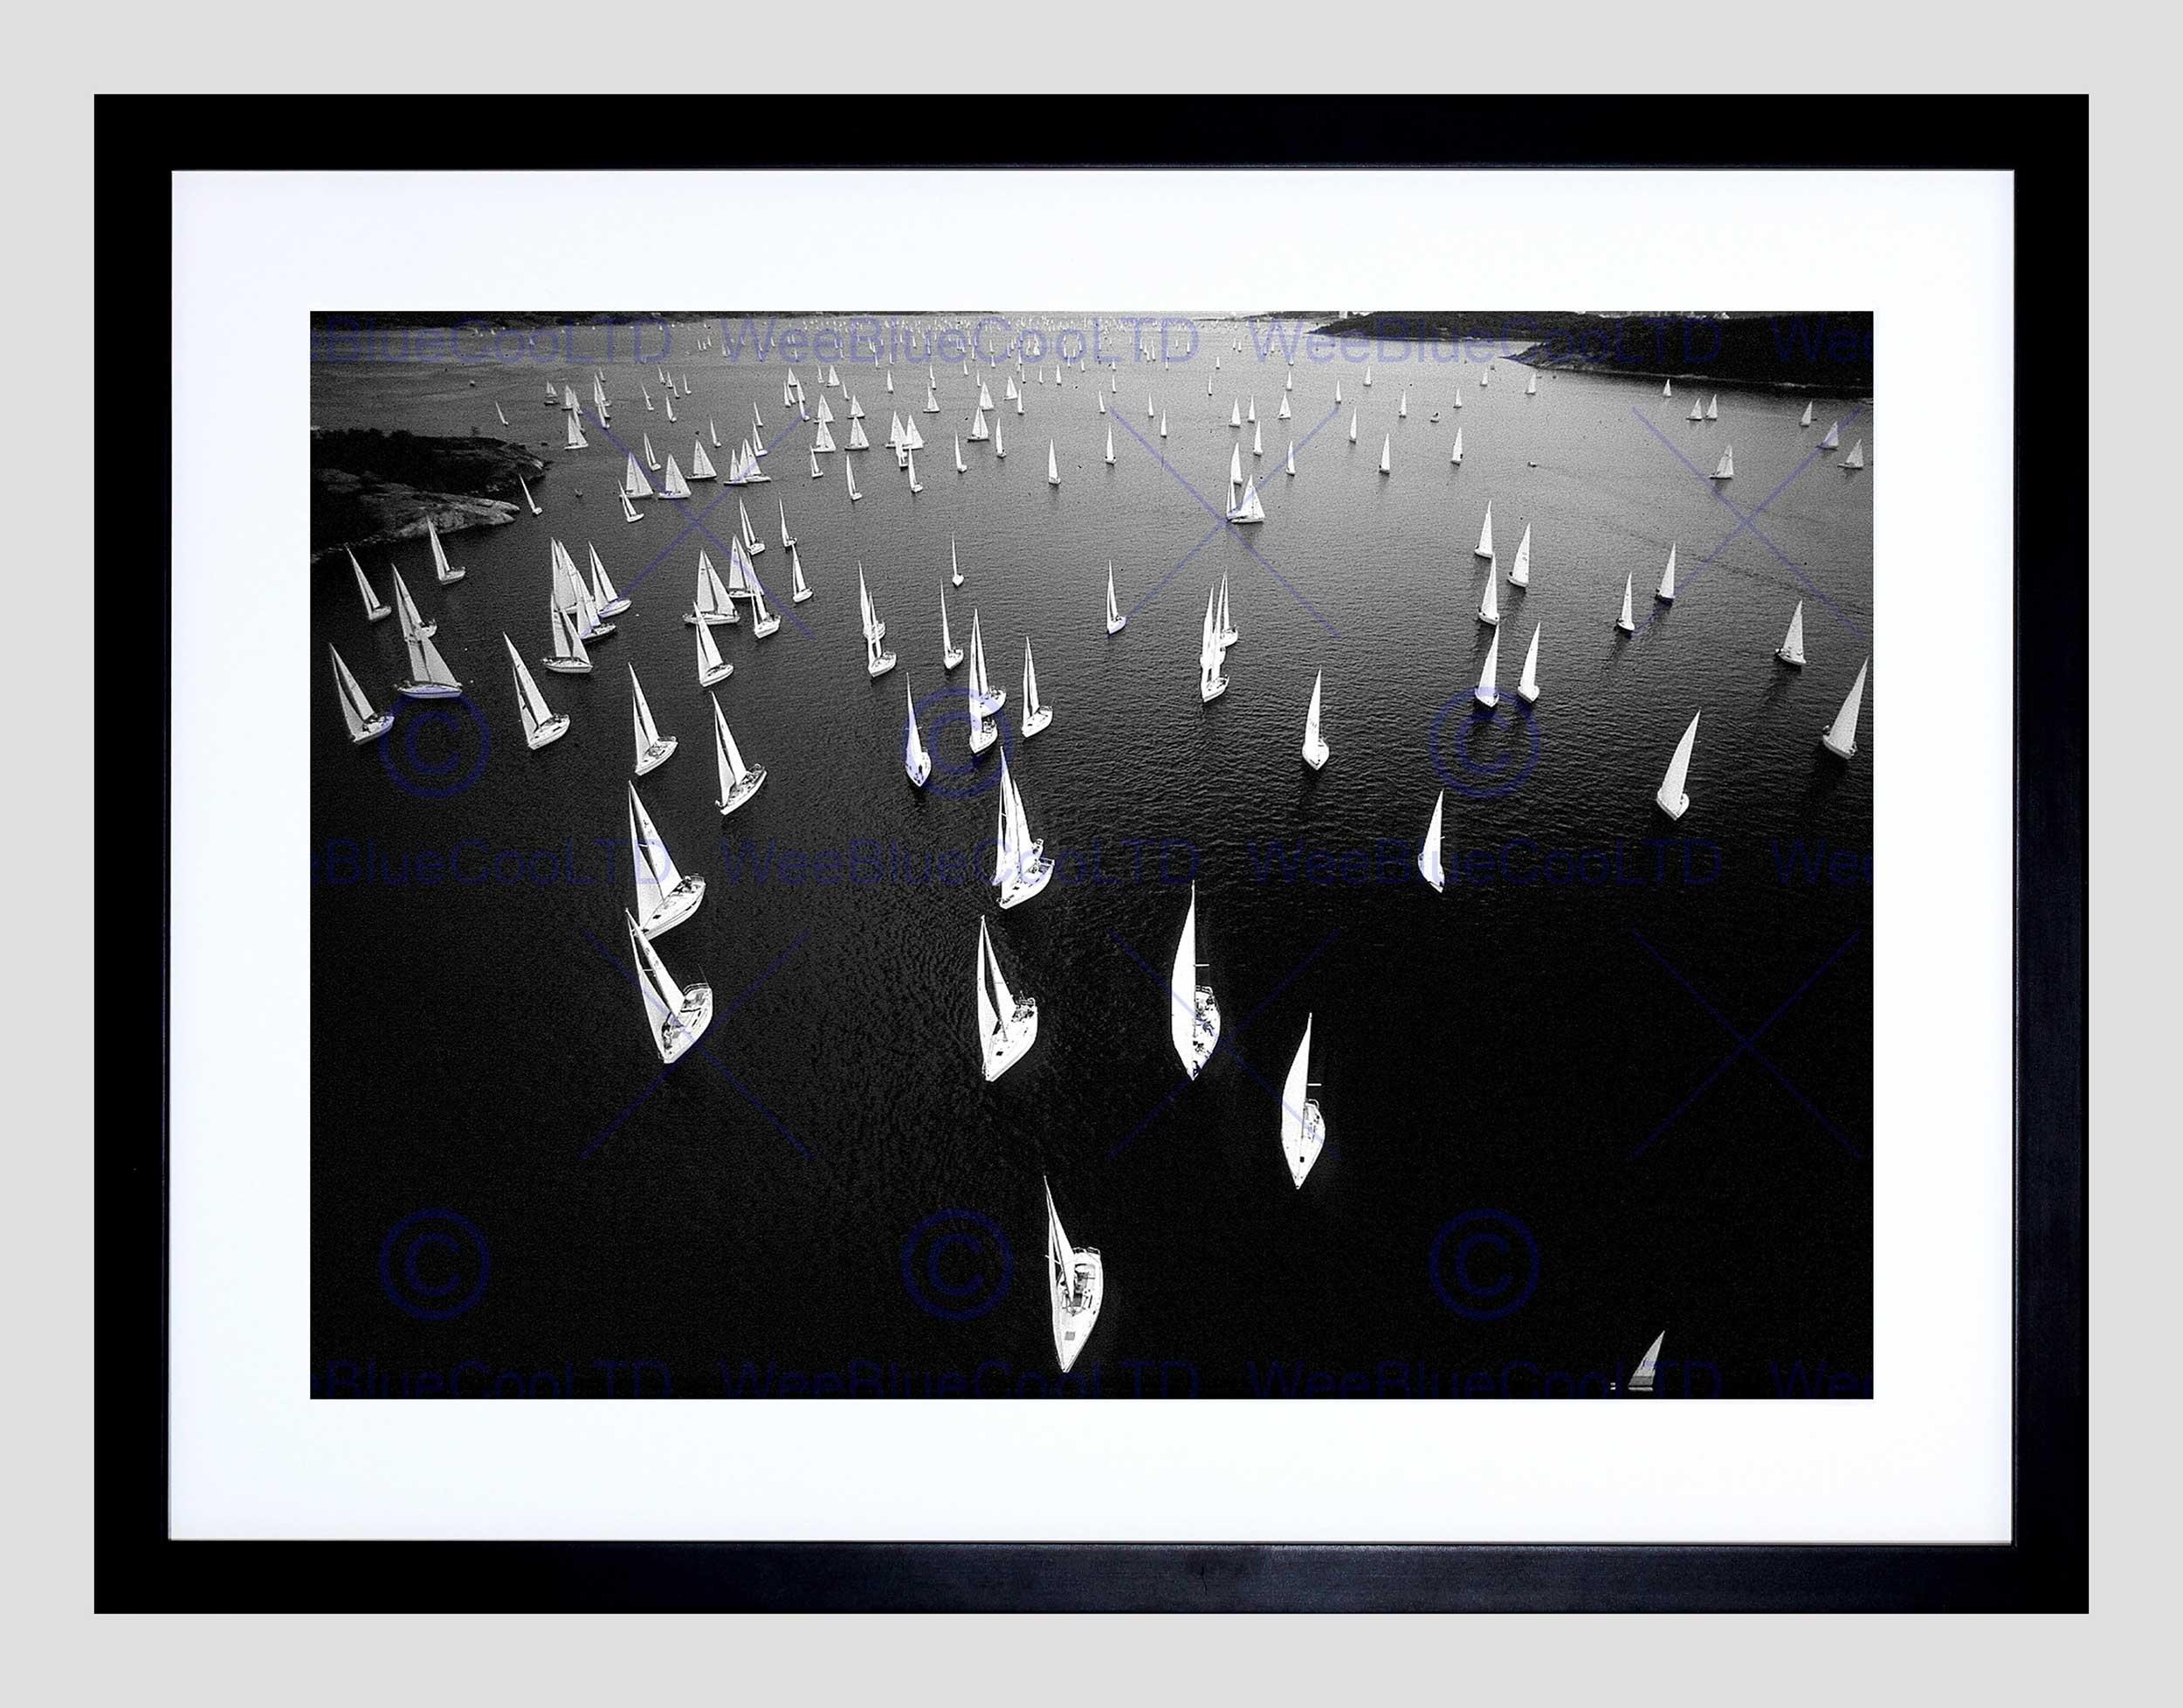 Black White Sail Boat Race Sea Black Frame Framed Art Print Inside Most Recently Released Black And White Framed Art Prints (View 3 of 15)